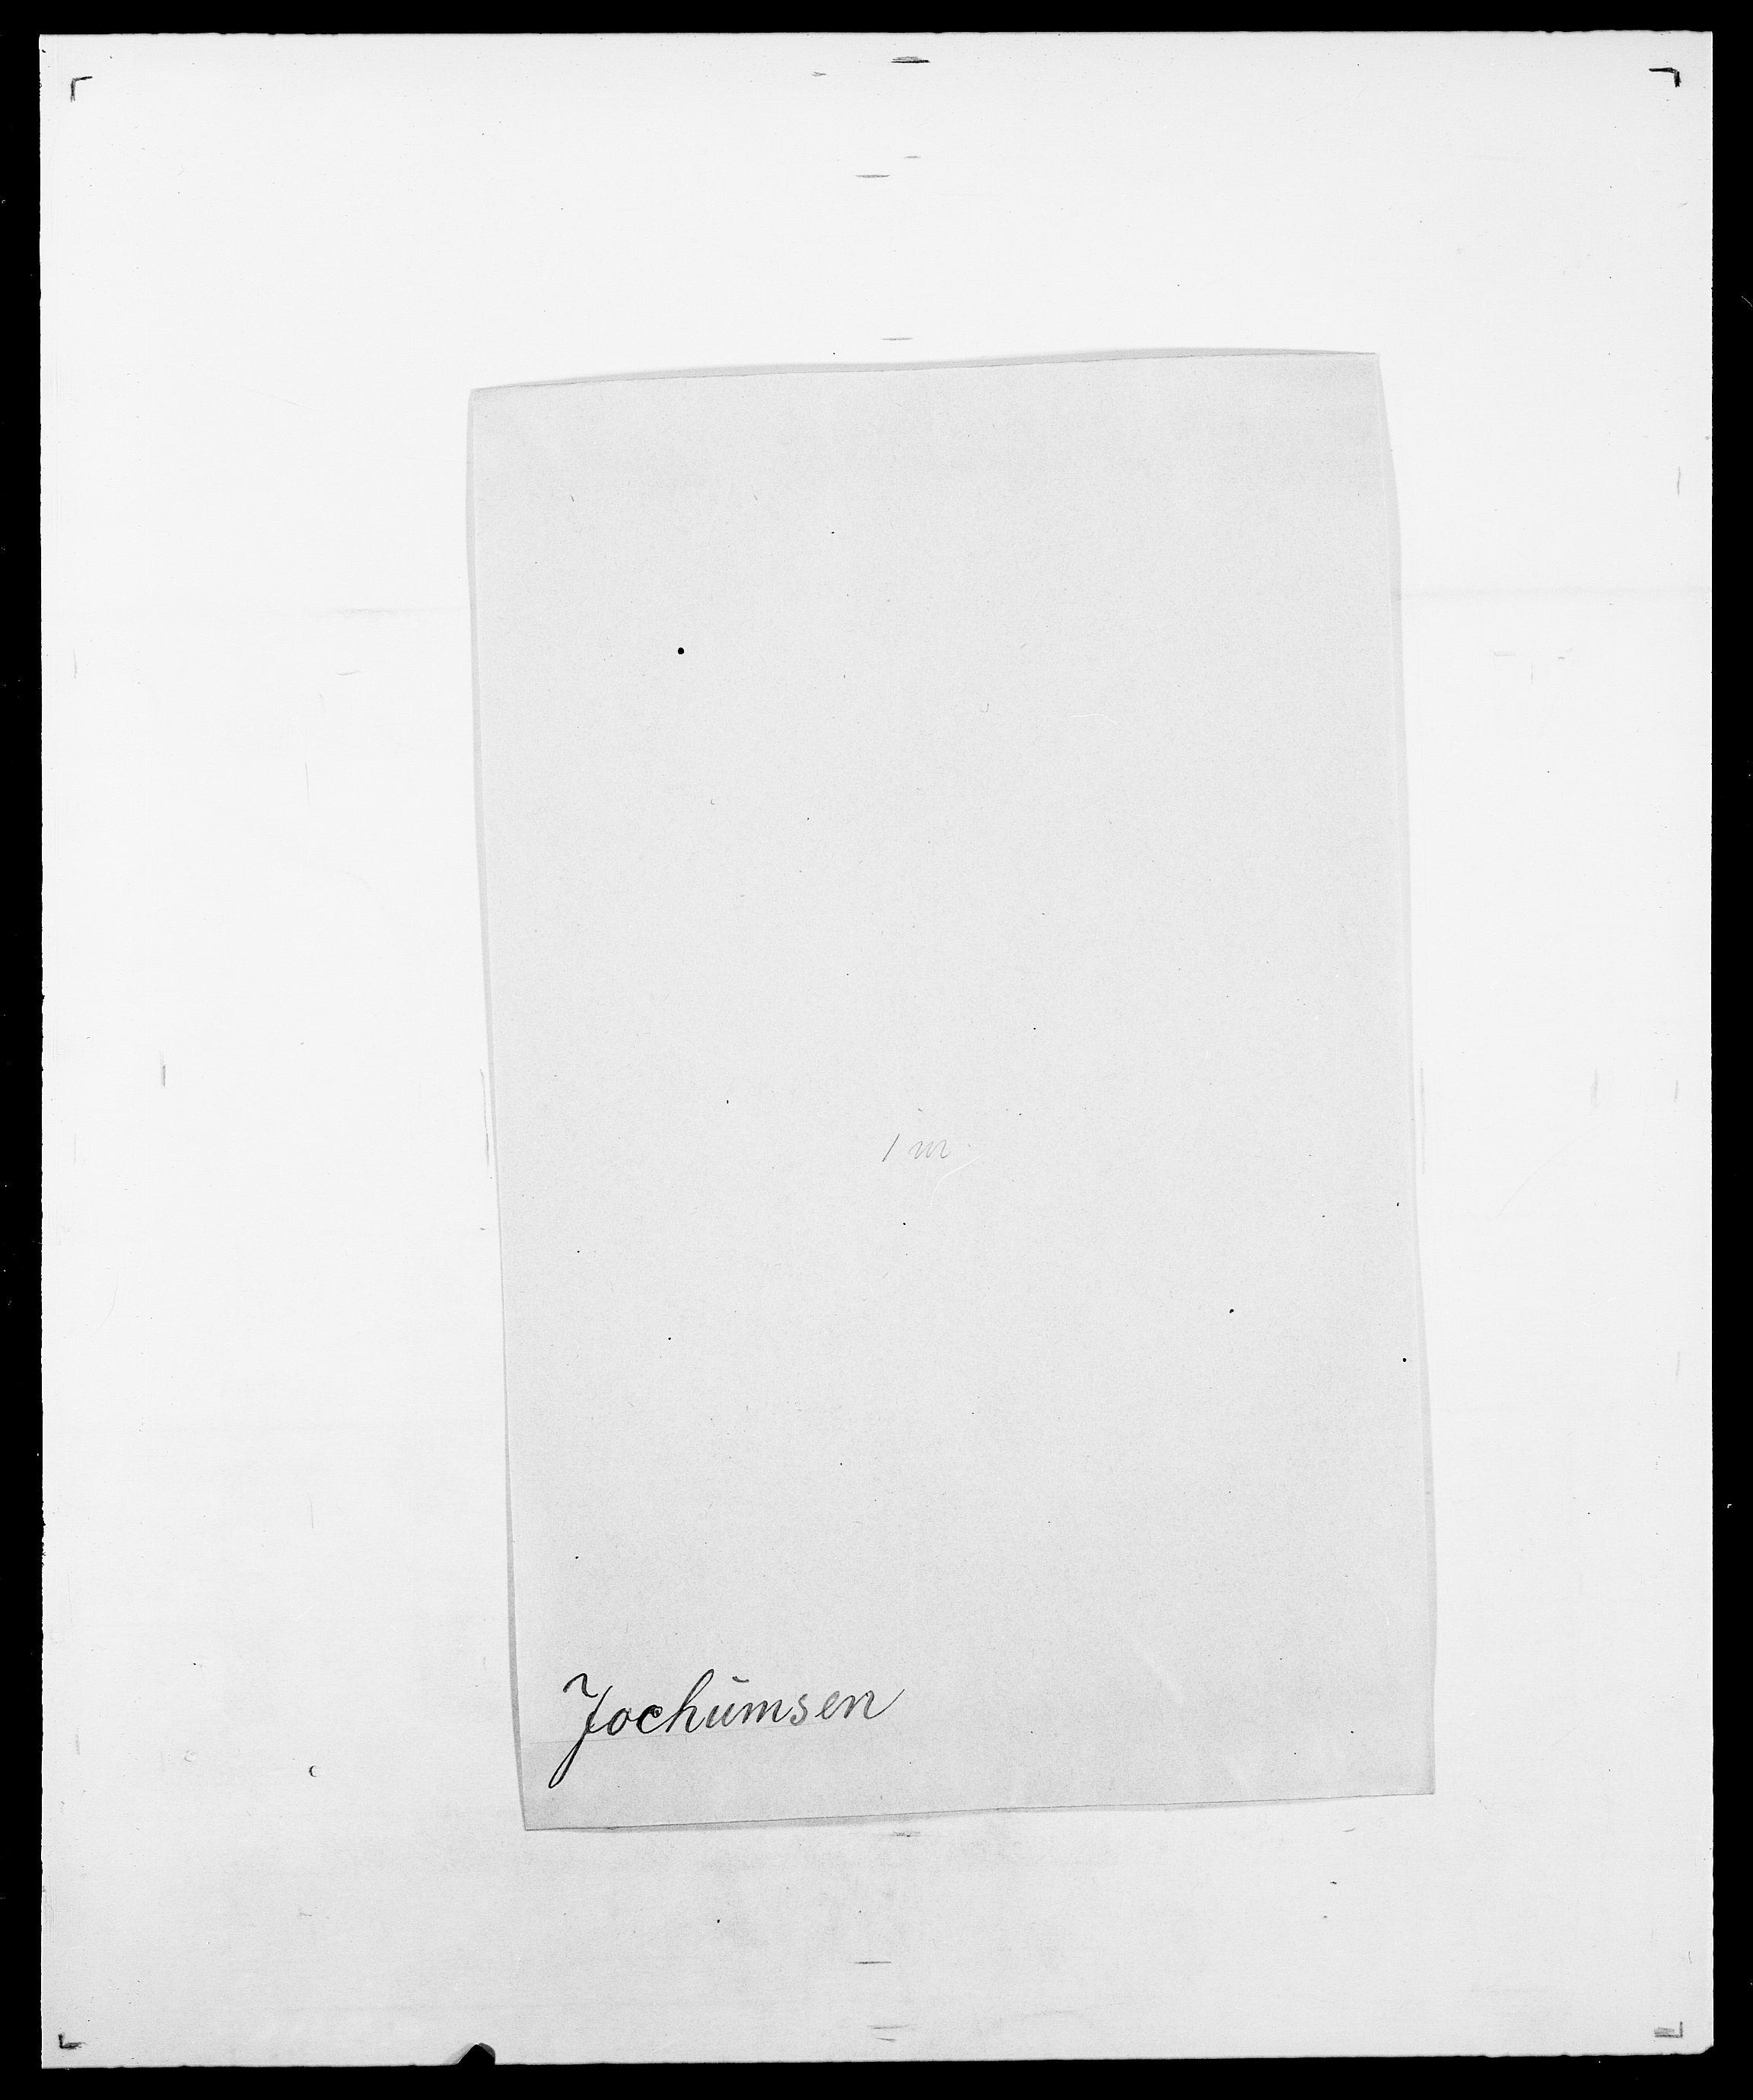 SAO, Delgobe, Charles Antoine - samling, D/Da/L0019: van der Hude - Joys, s. 808